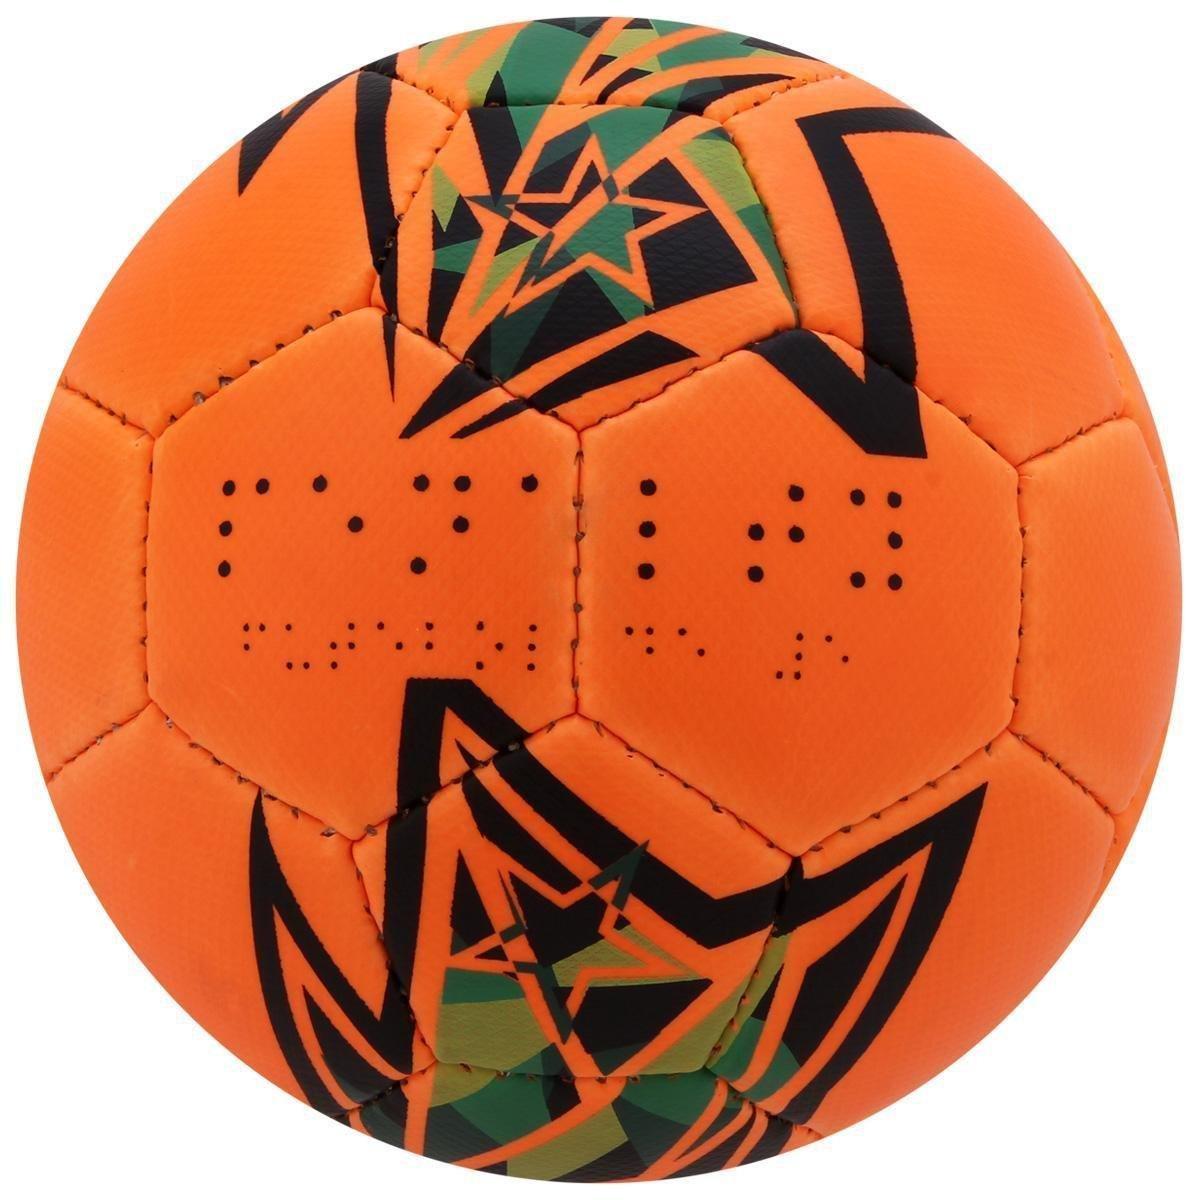 bd3681d66e Bola Futebol Penalty Guizo 4 Futsal - Laranja Escuro - Compre Agora ...